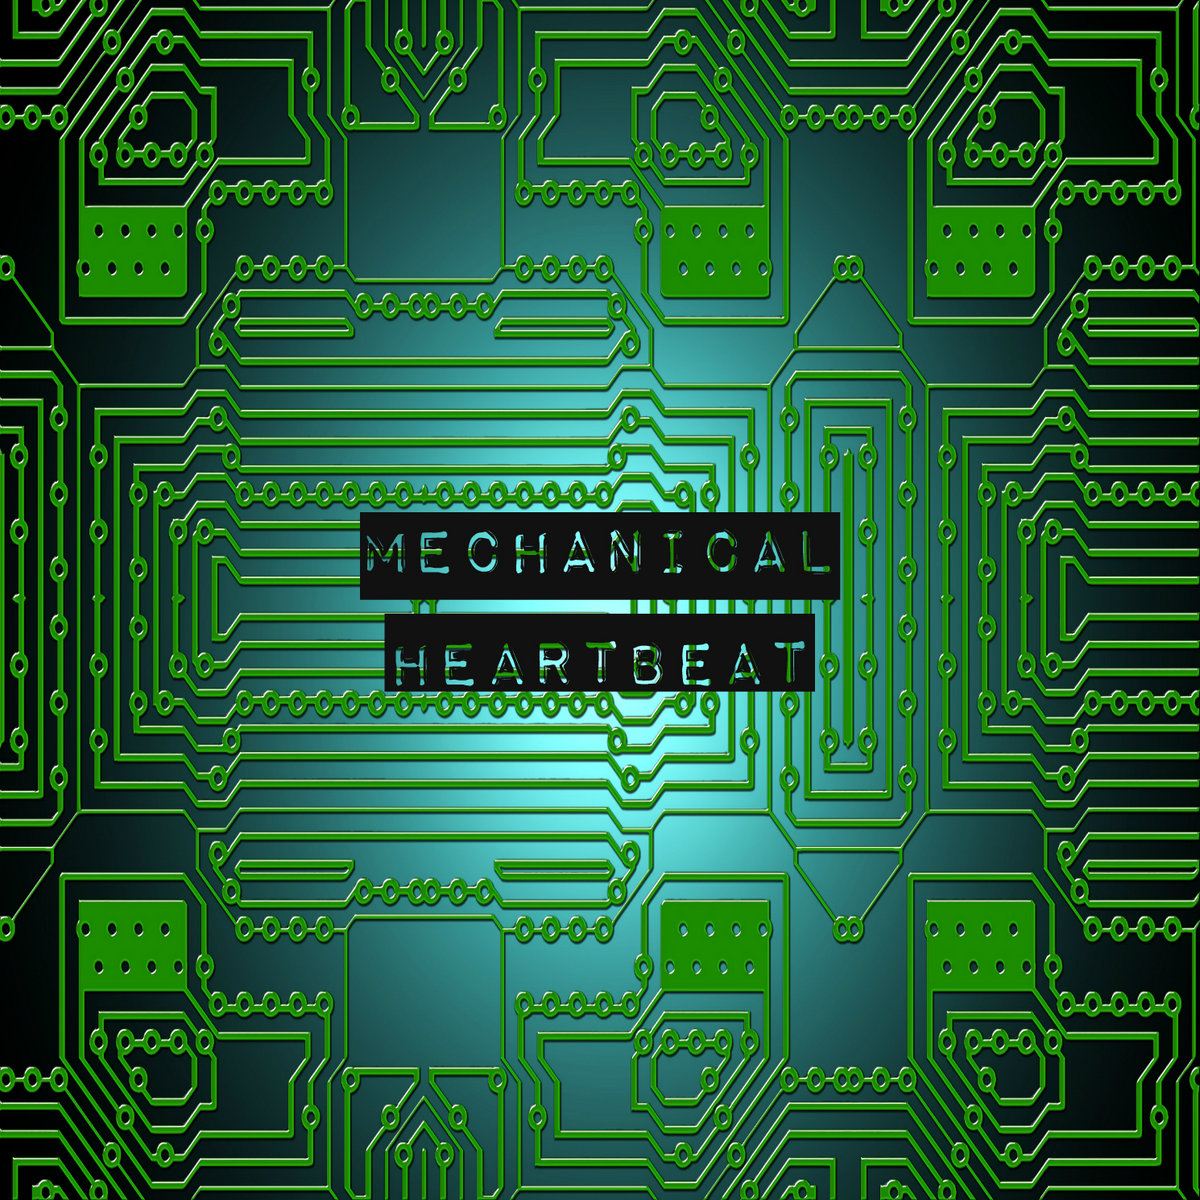 Blurred Lines | Mechanical Heartbeat